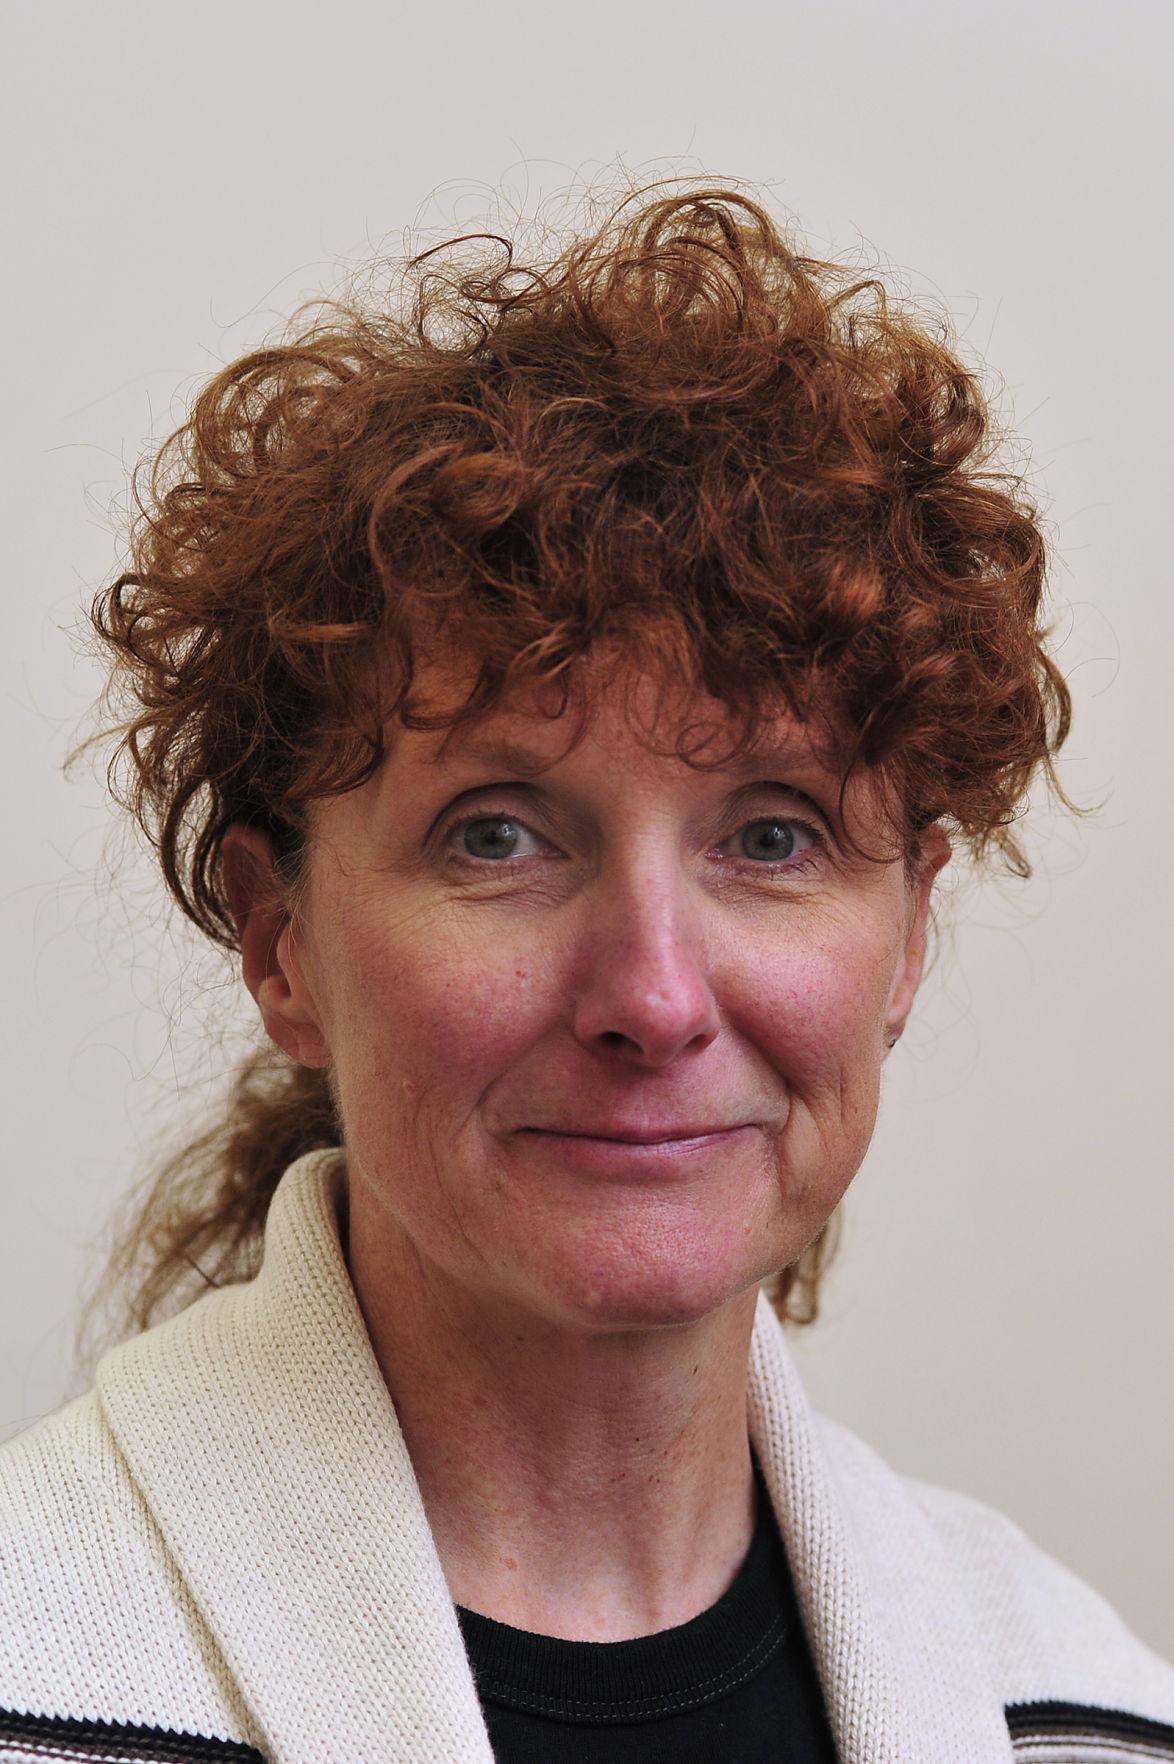 Dottie-Kay Bowersox